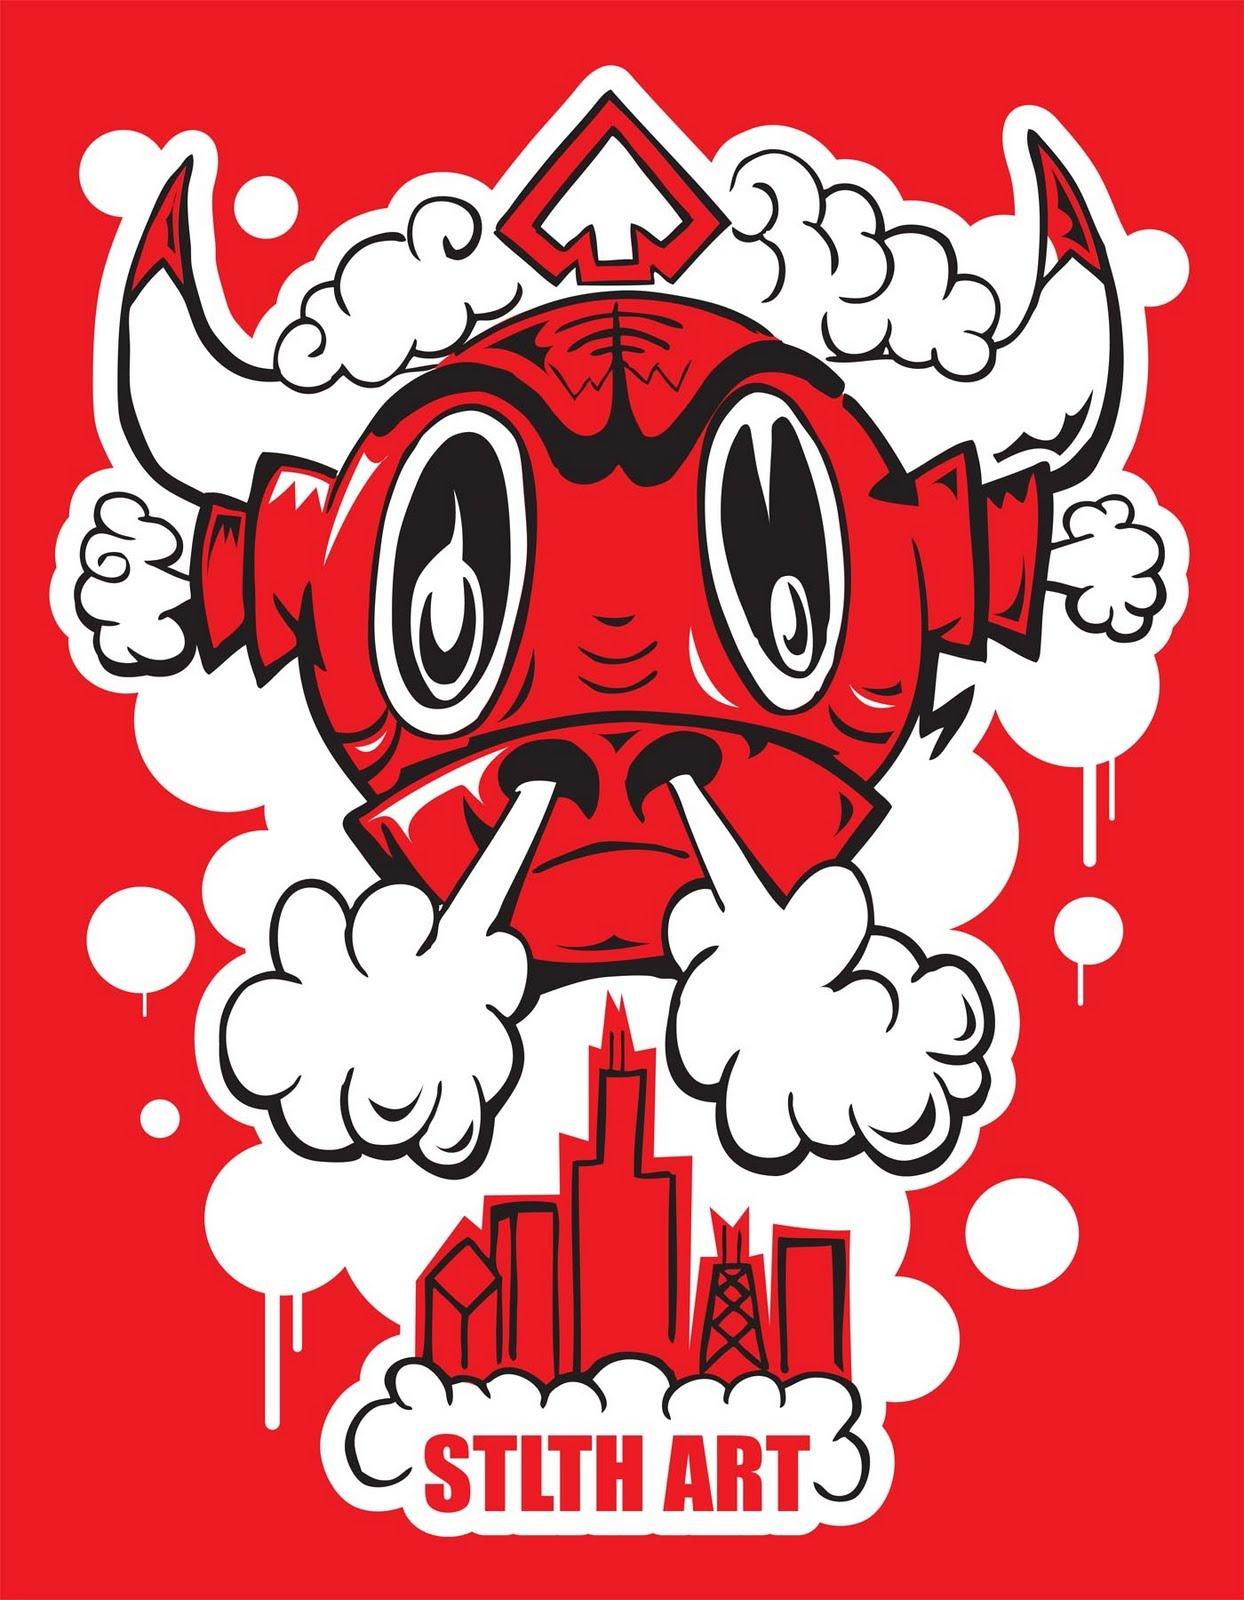 stlth art x chicago bulls t shirt fashion